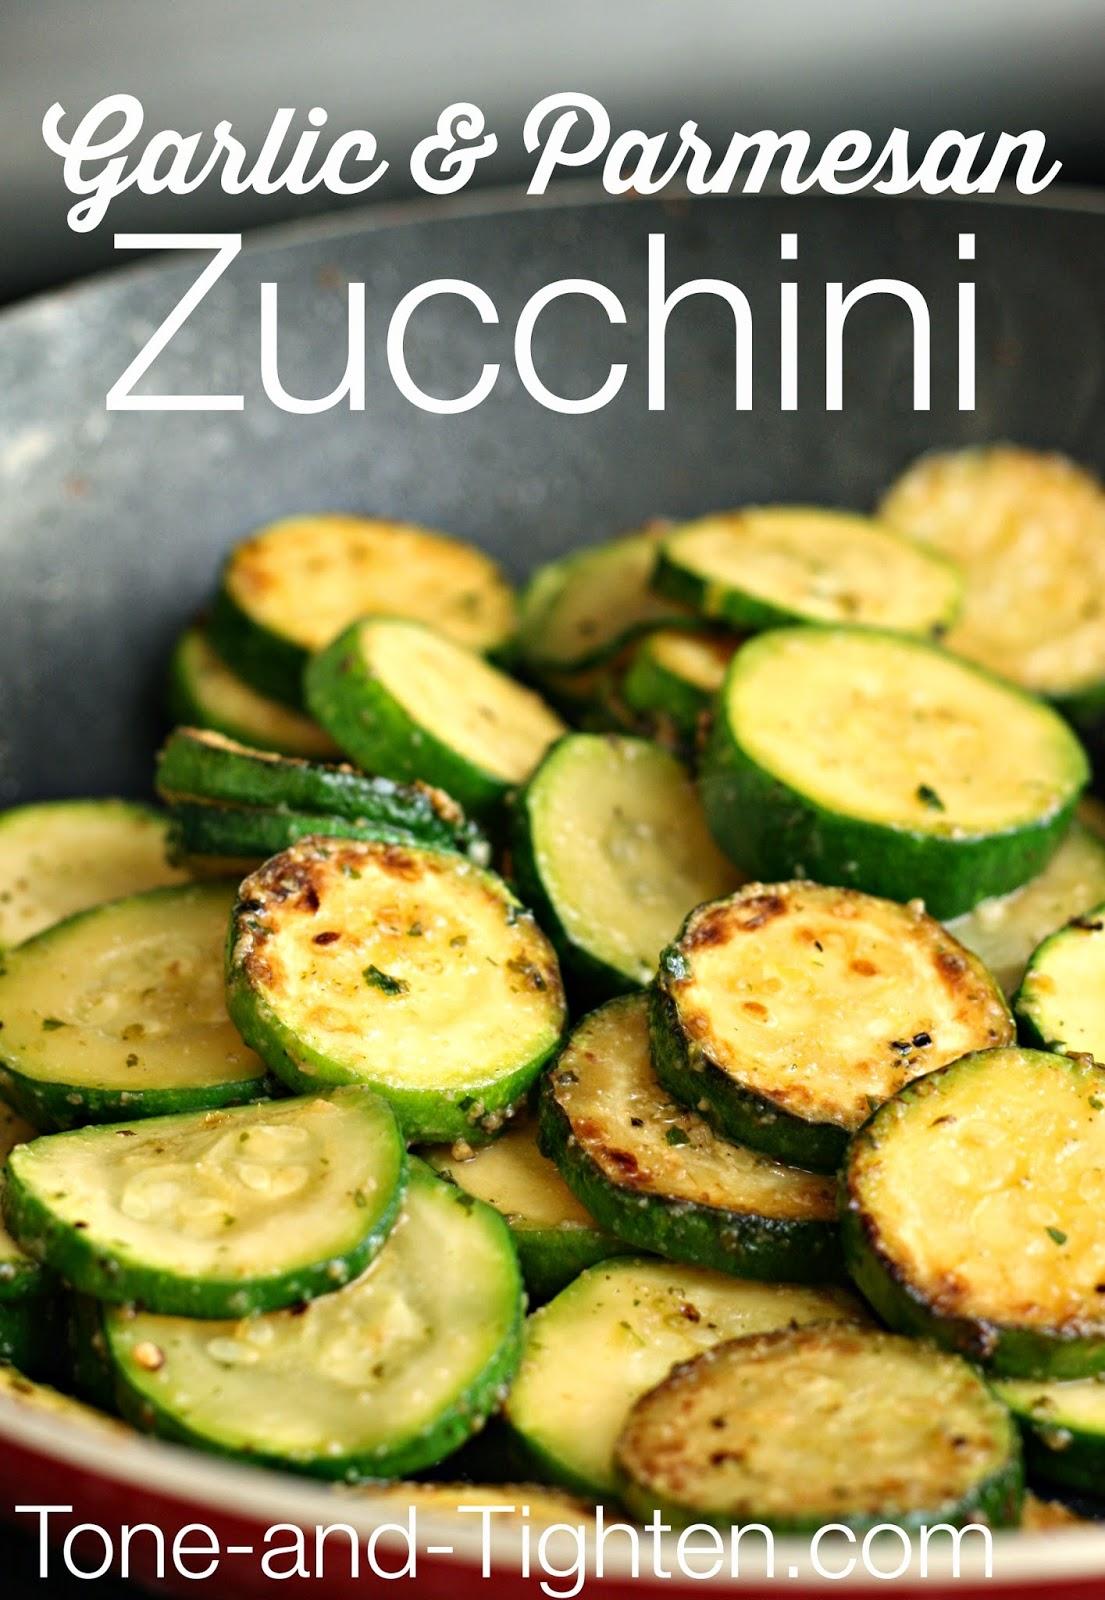 Garlic & Parmesan Zucchini